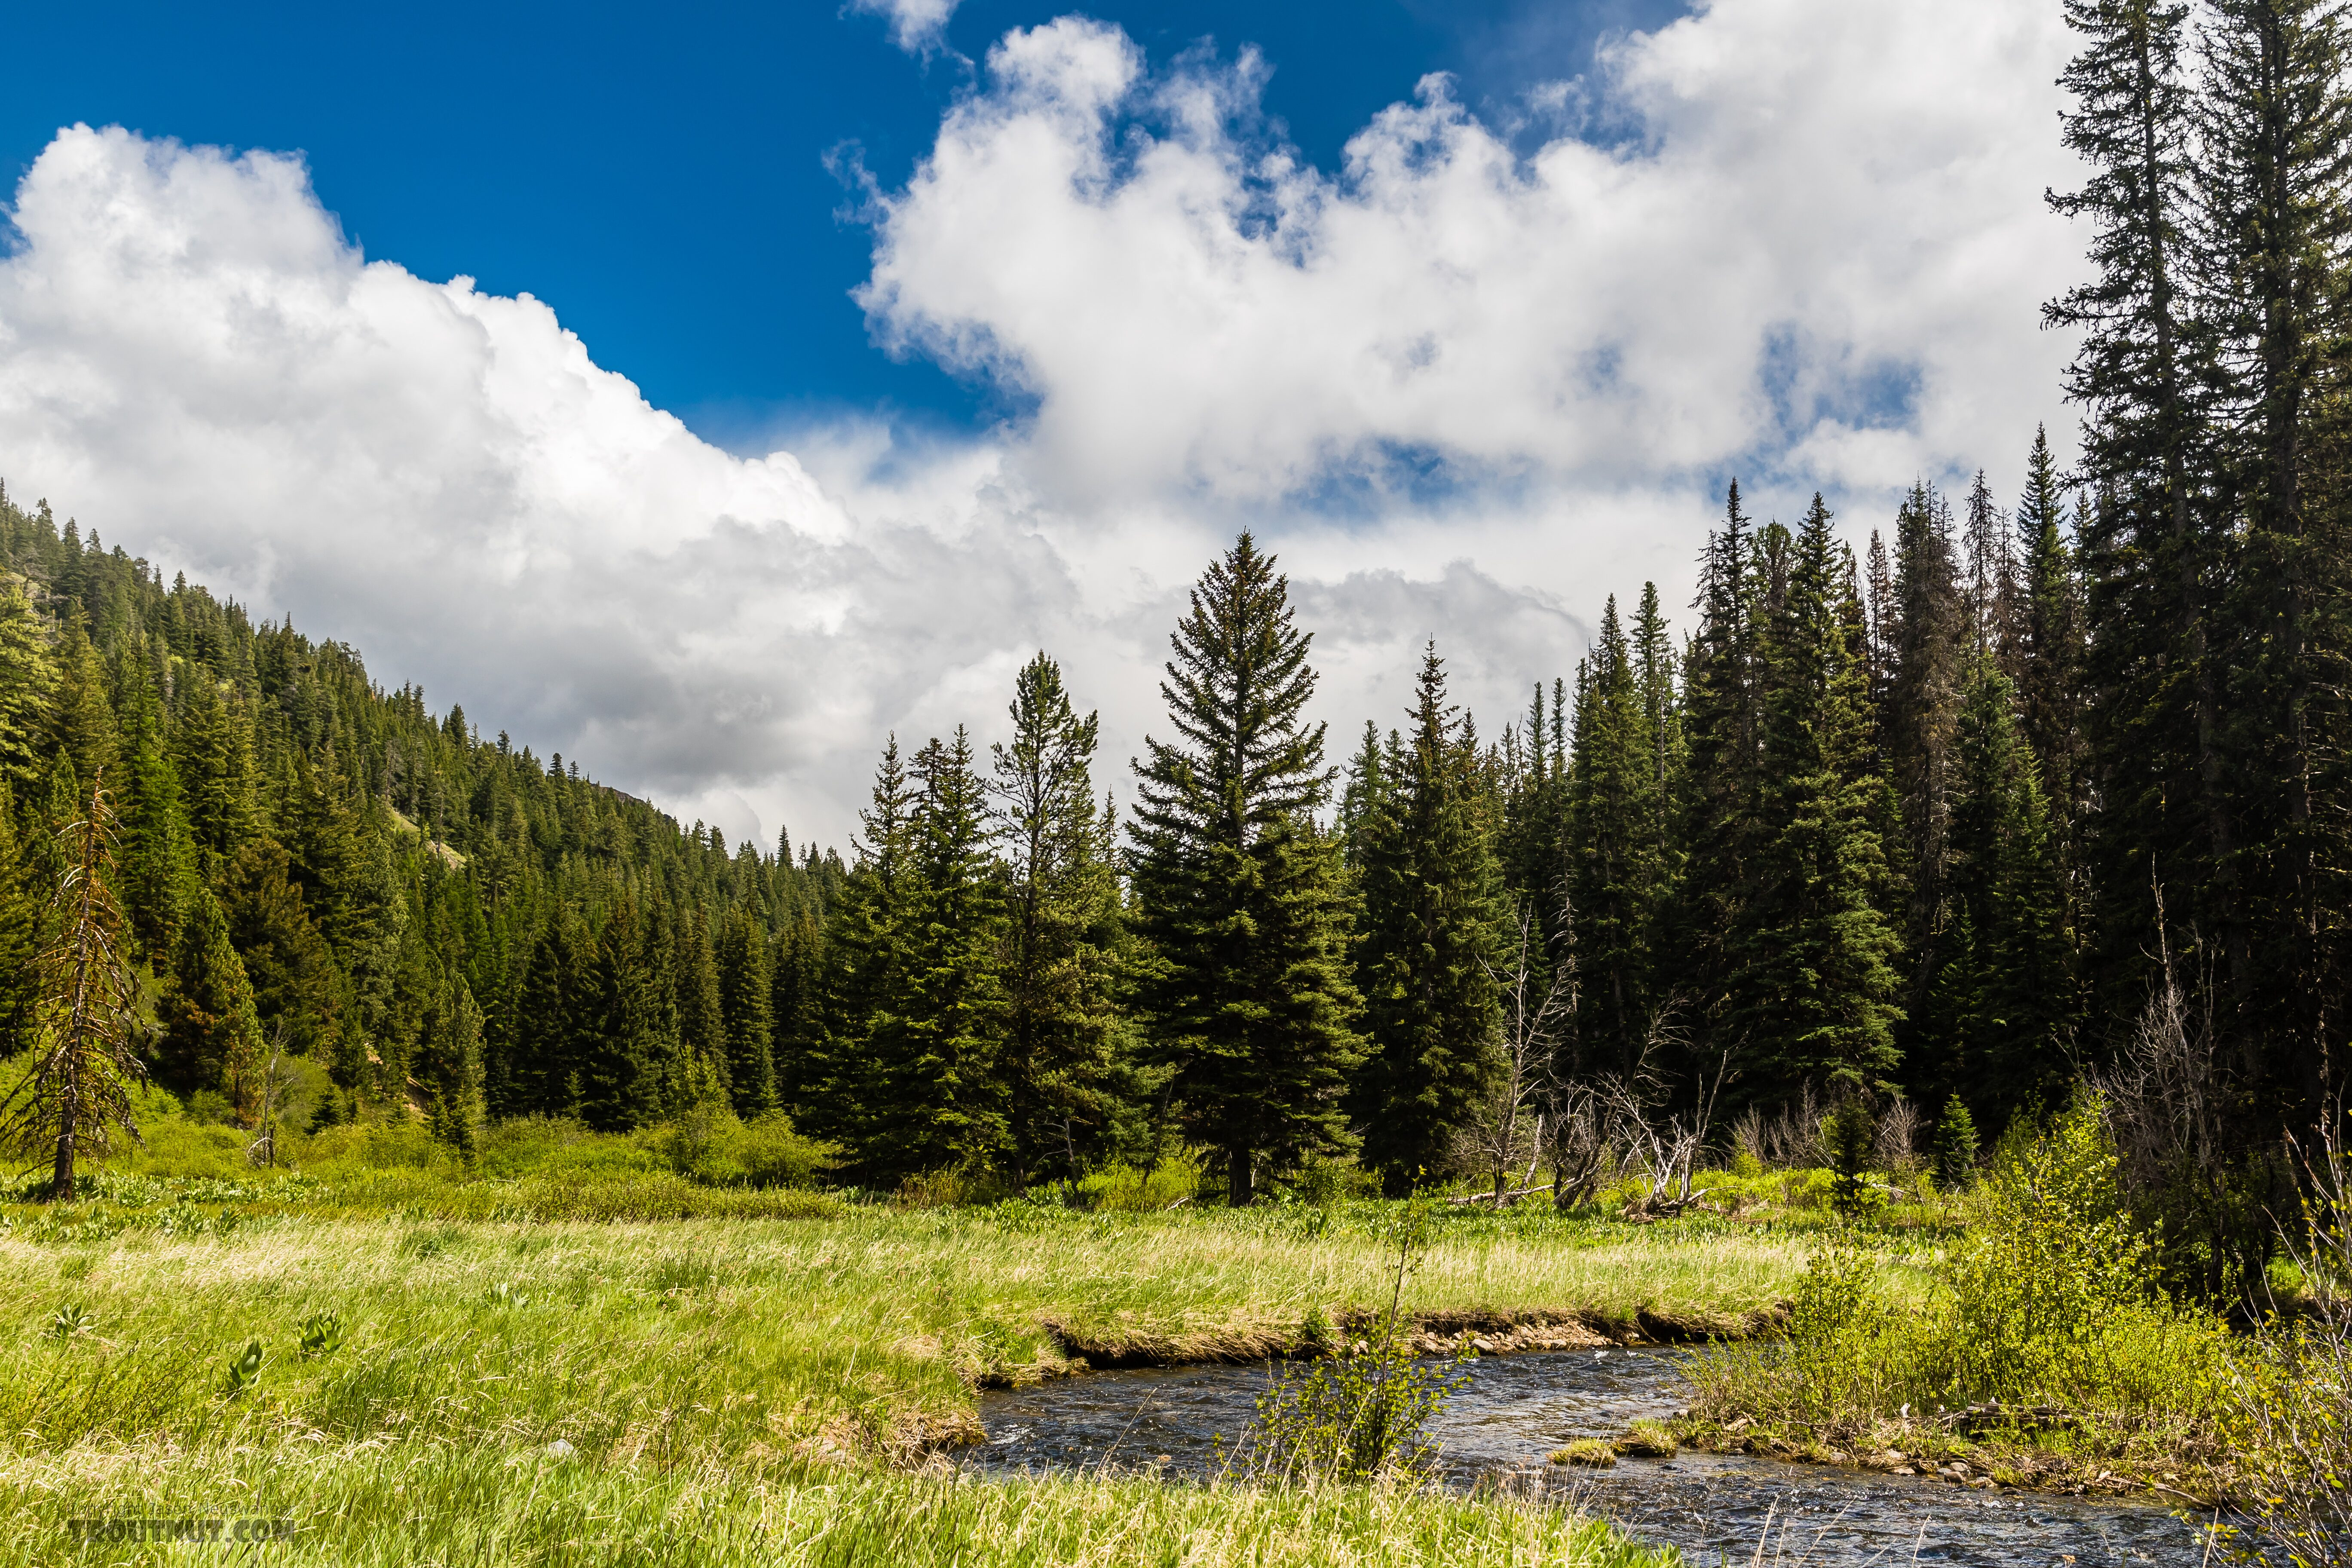 From the South Fork Manastash Creek in Washington.